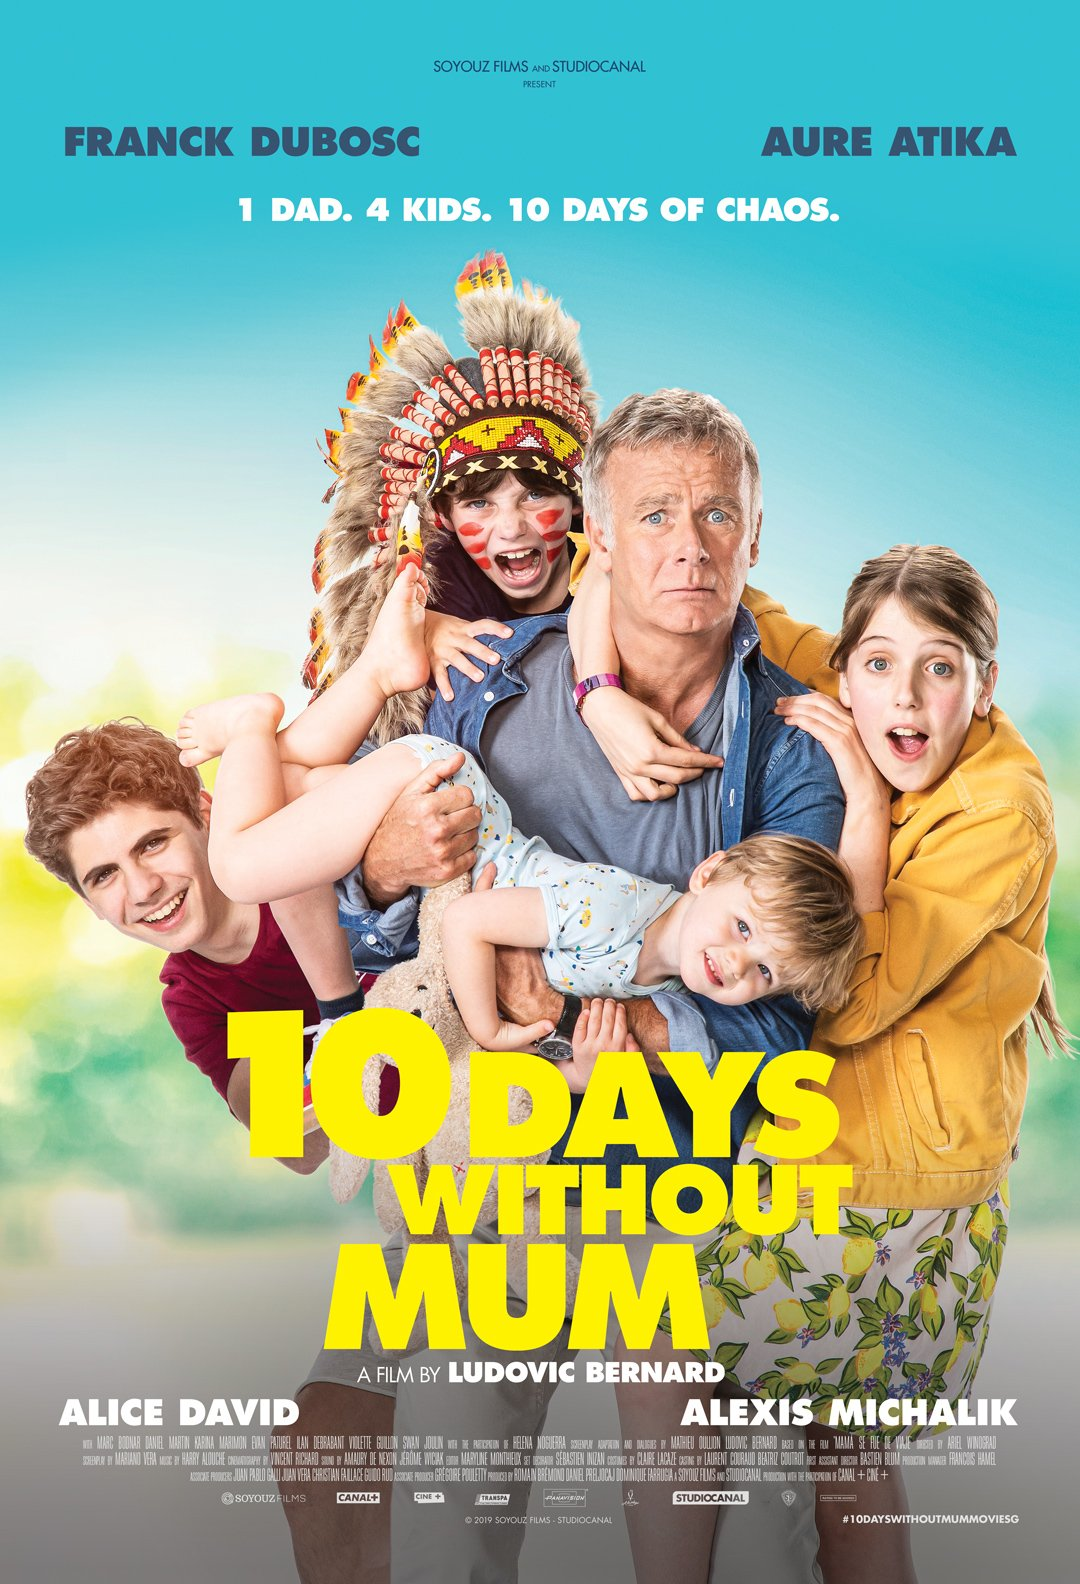 10 Days Without Mum